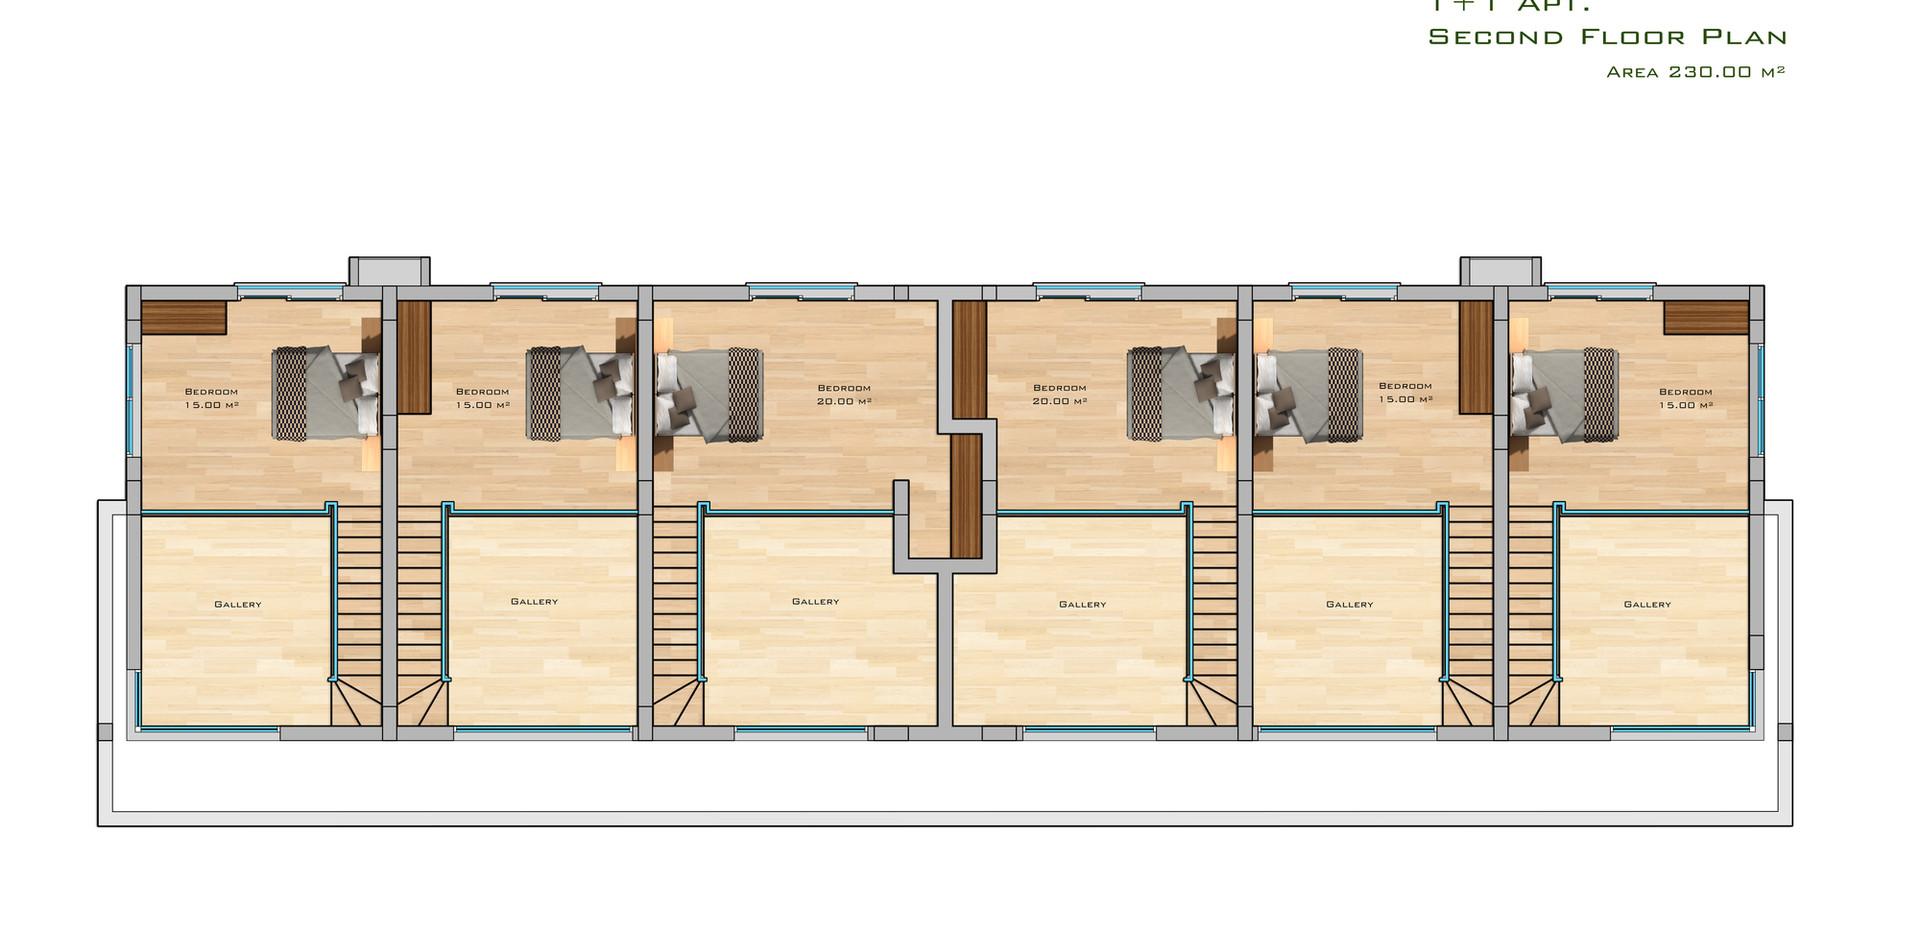 1+1 apt  second floor plan.jpg